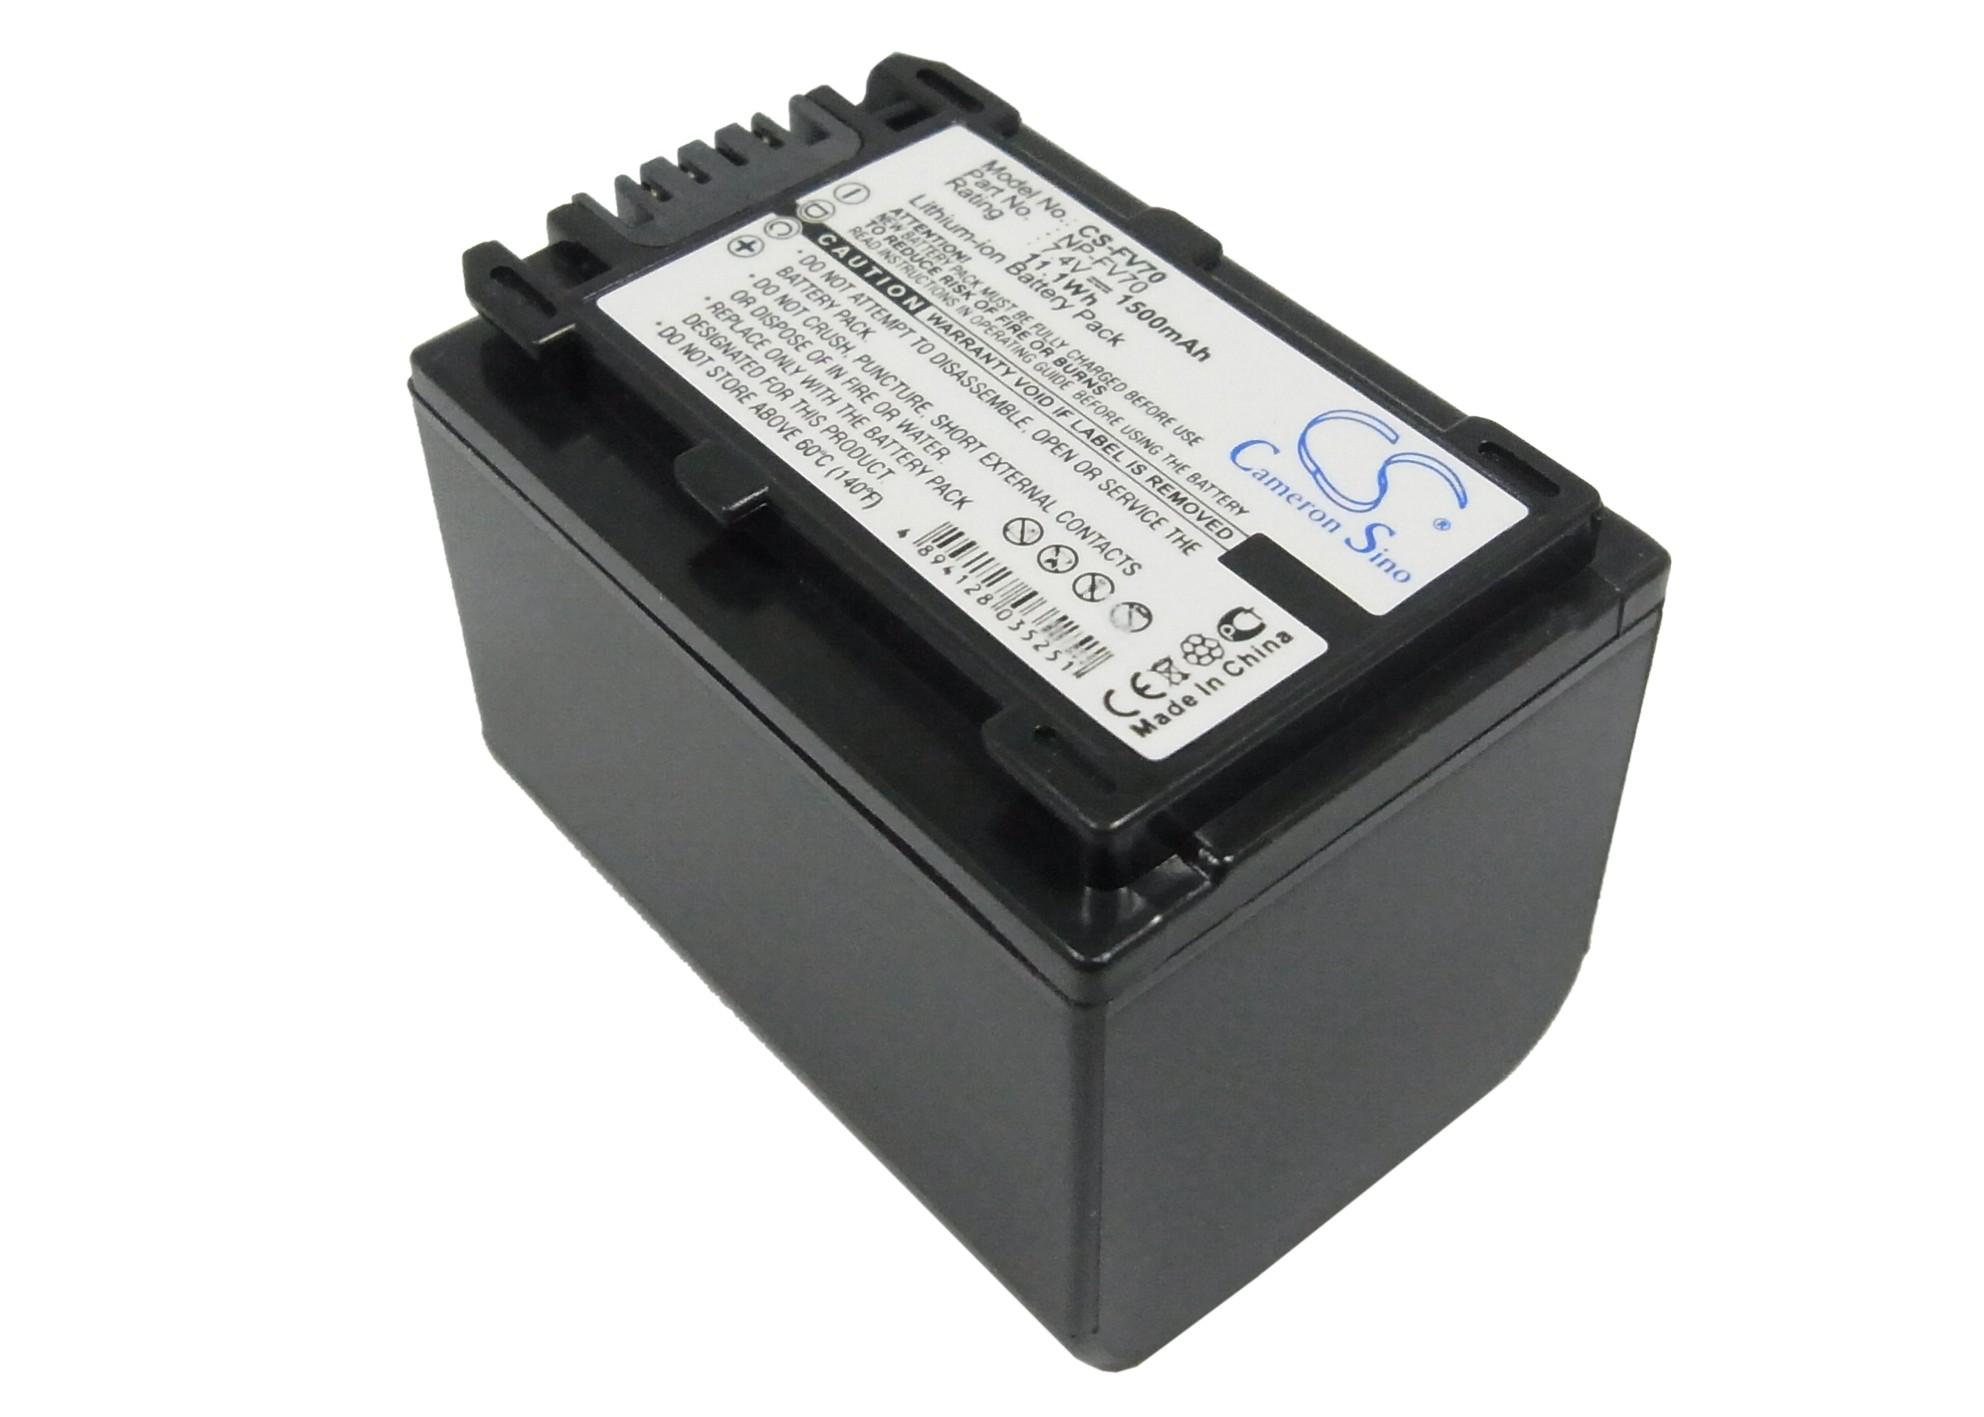 Cameron Sino baterie do kamer a fotoaparátů pro SONY DCR-SX43R 7.4V Li-ion 1500mAh černá - neoriginální